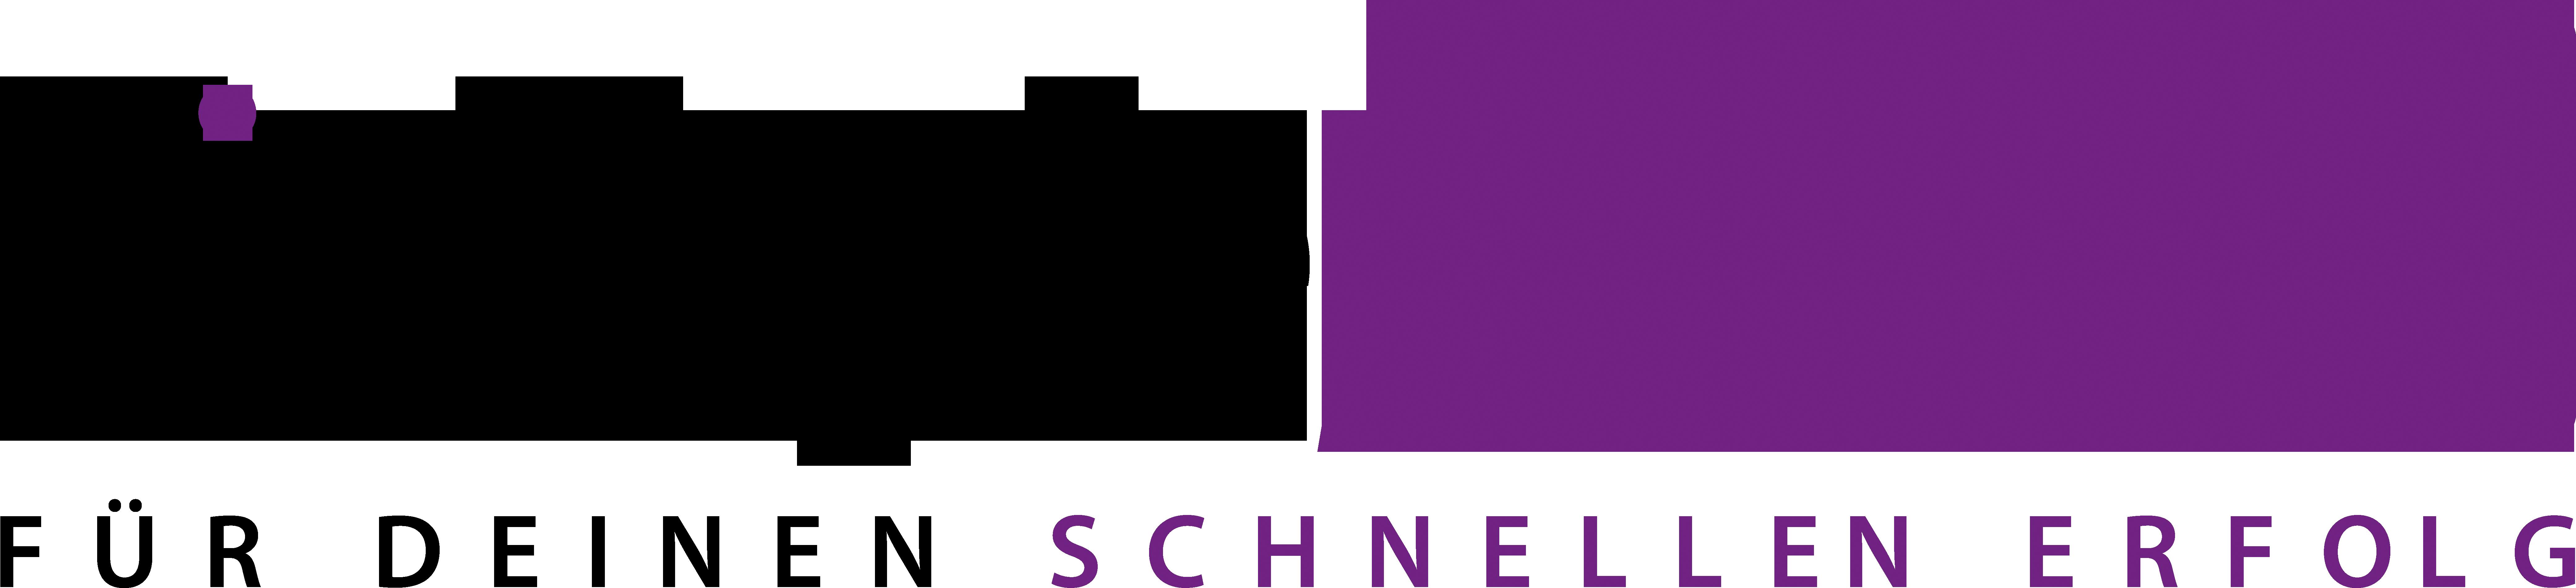 FitStyle Ladies Stuttgart Logo